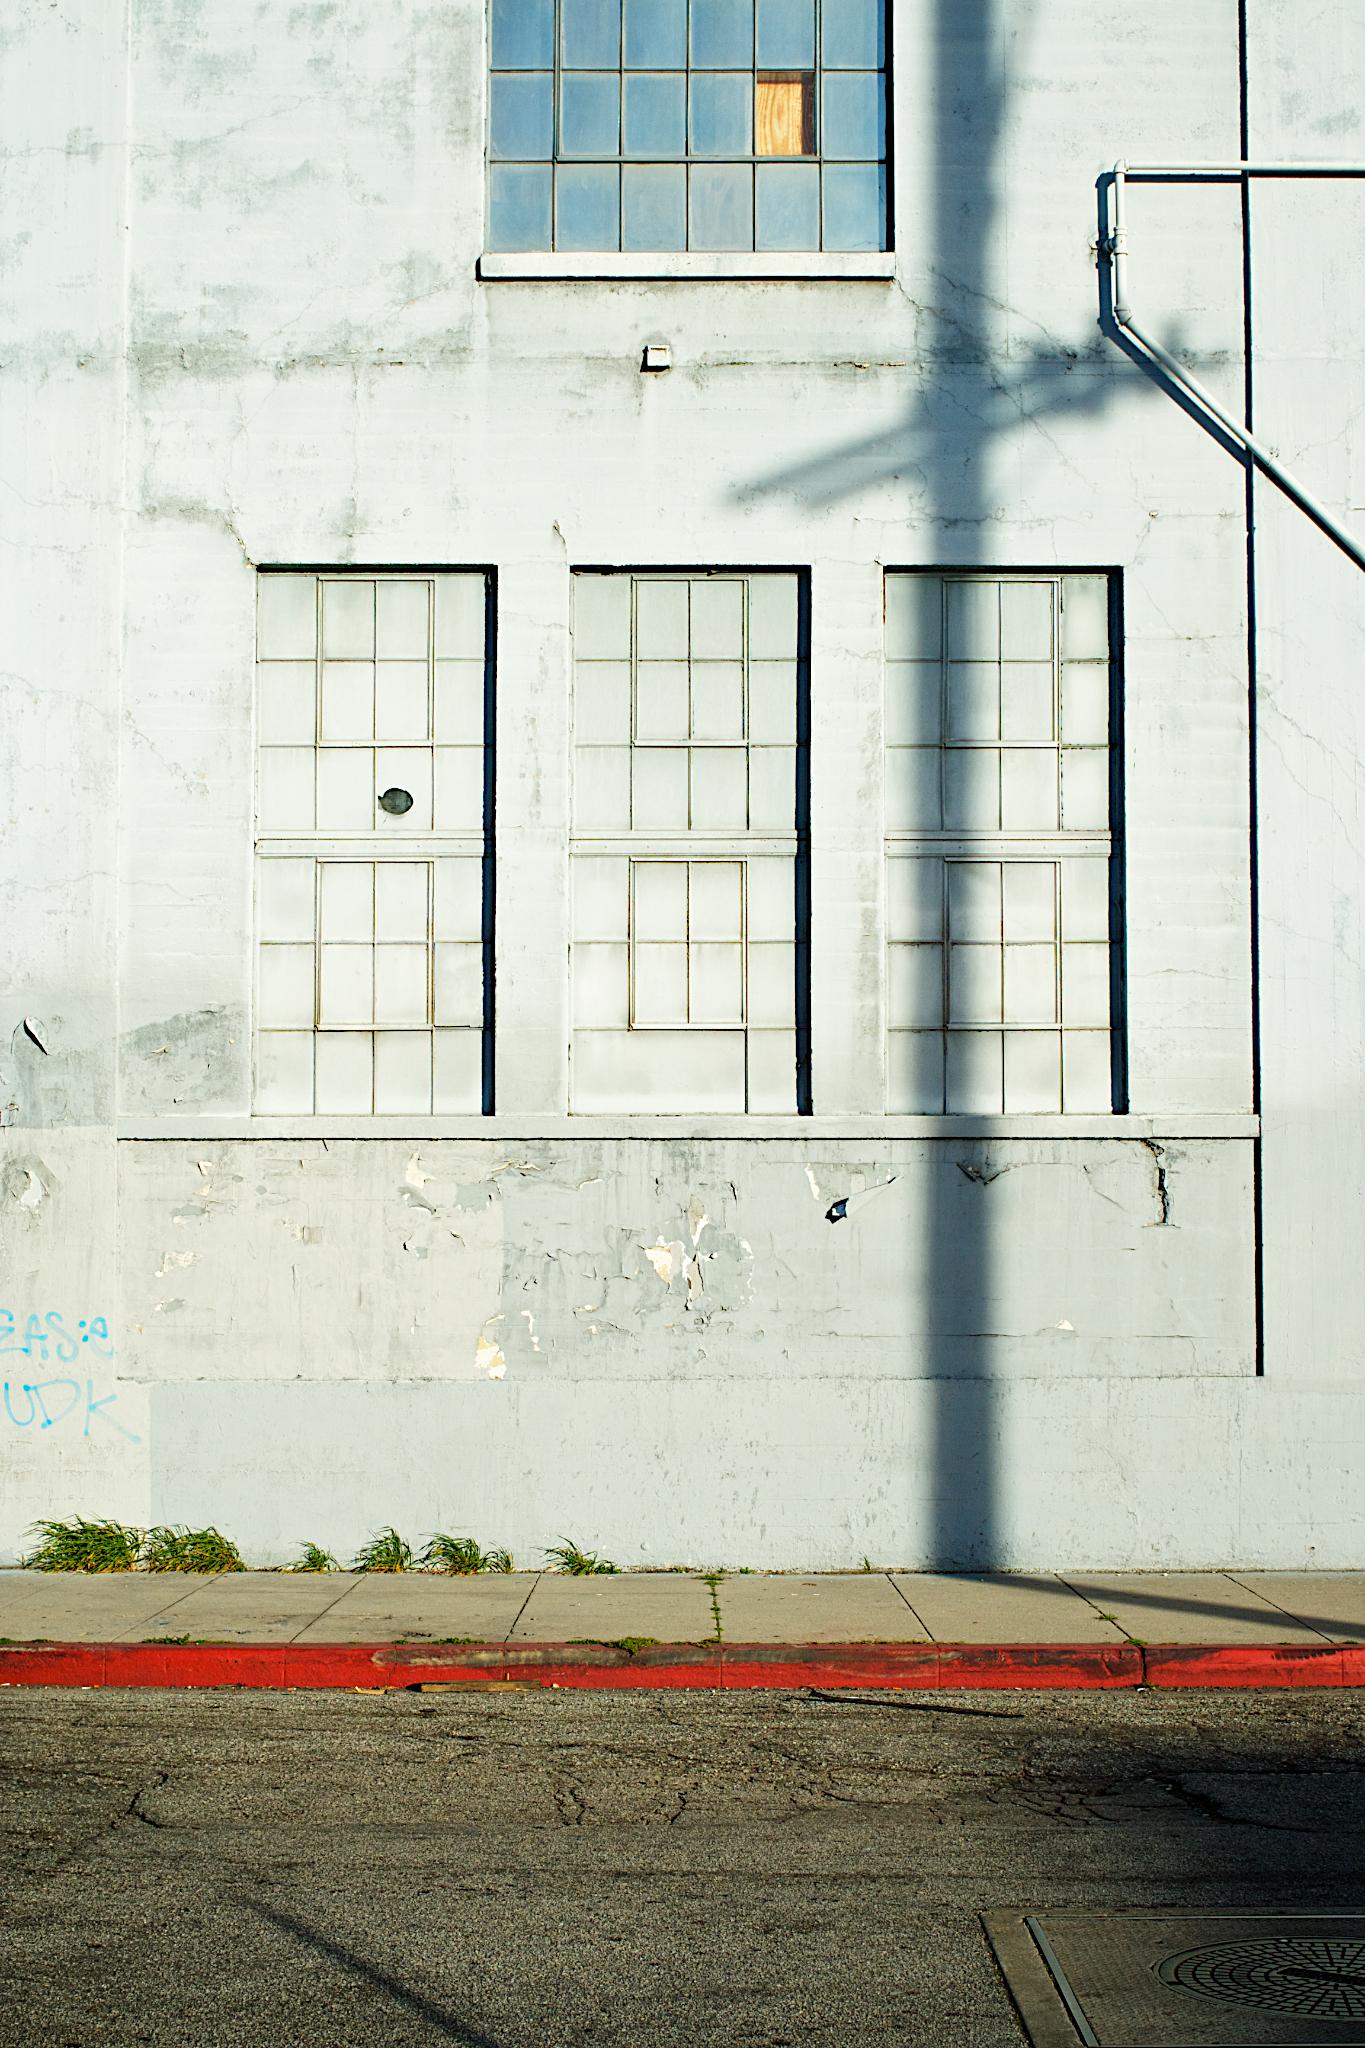 ceethreedom street photos.013.jpg